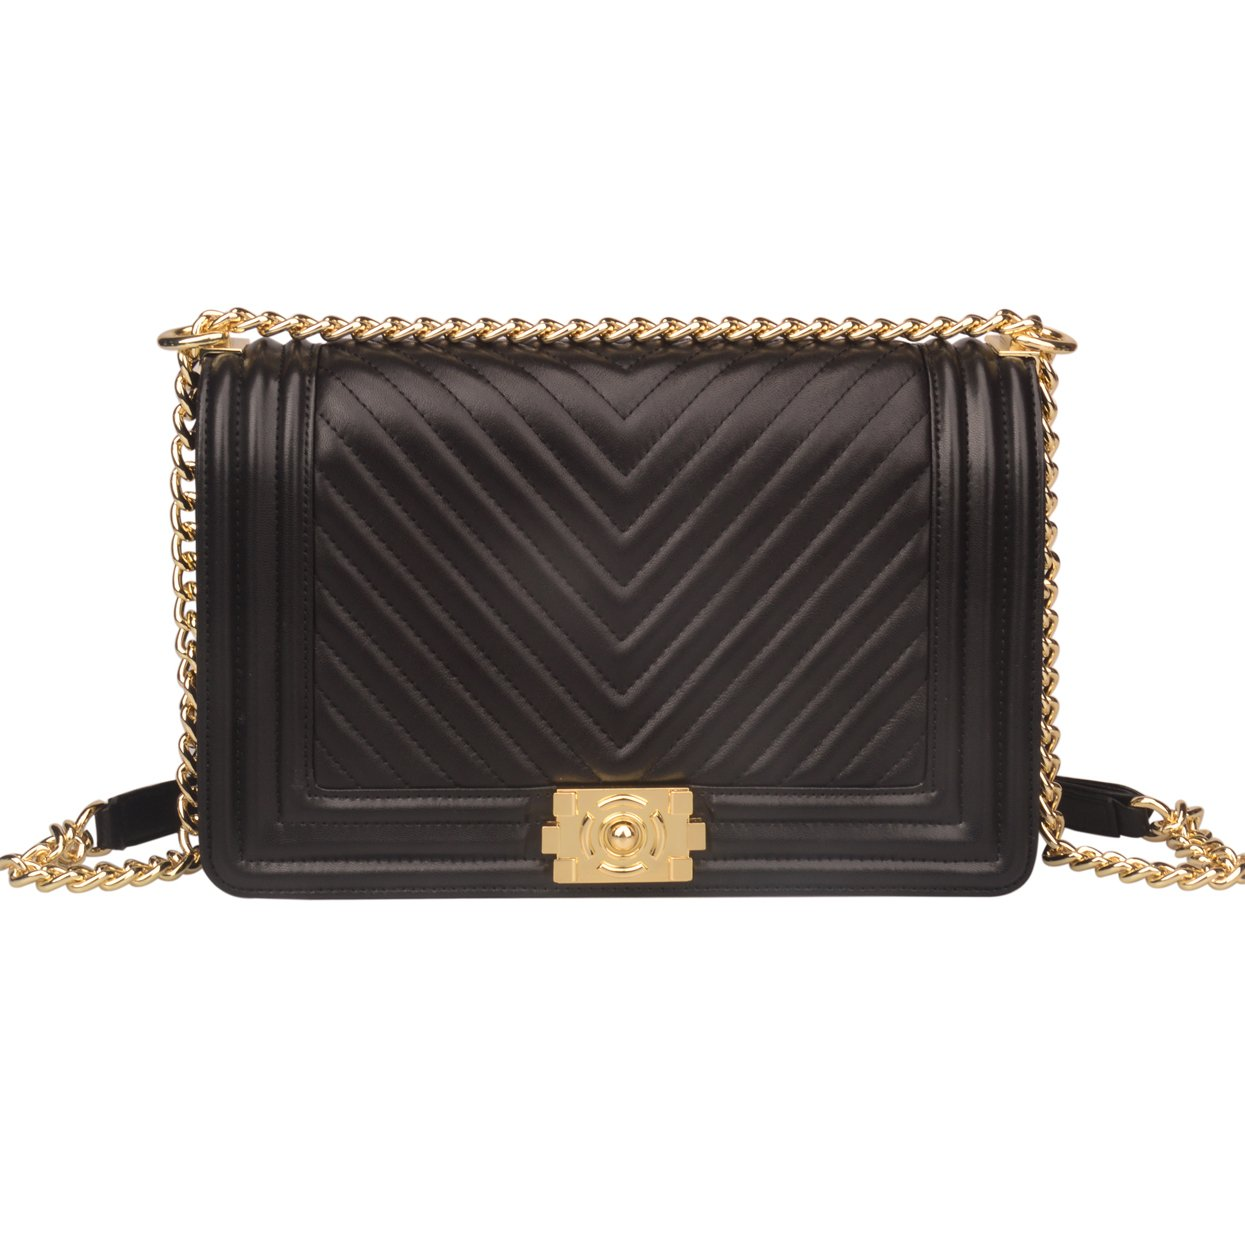 db76f289e104 Ainifeel Women s Genuine Leather Quilted Chain Strap Handbags Hobo Bag  Crossbody (Medium